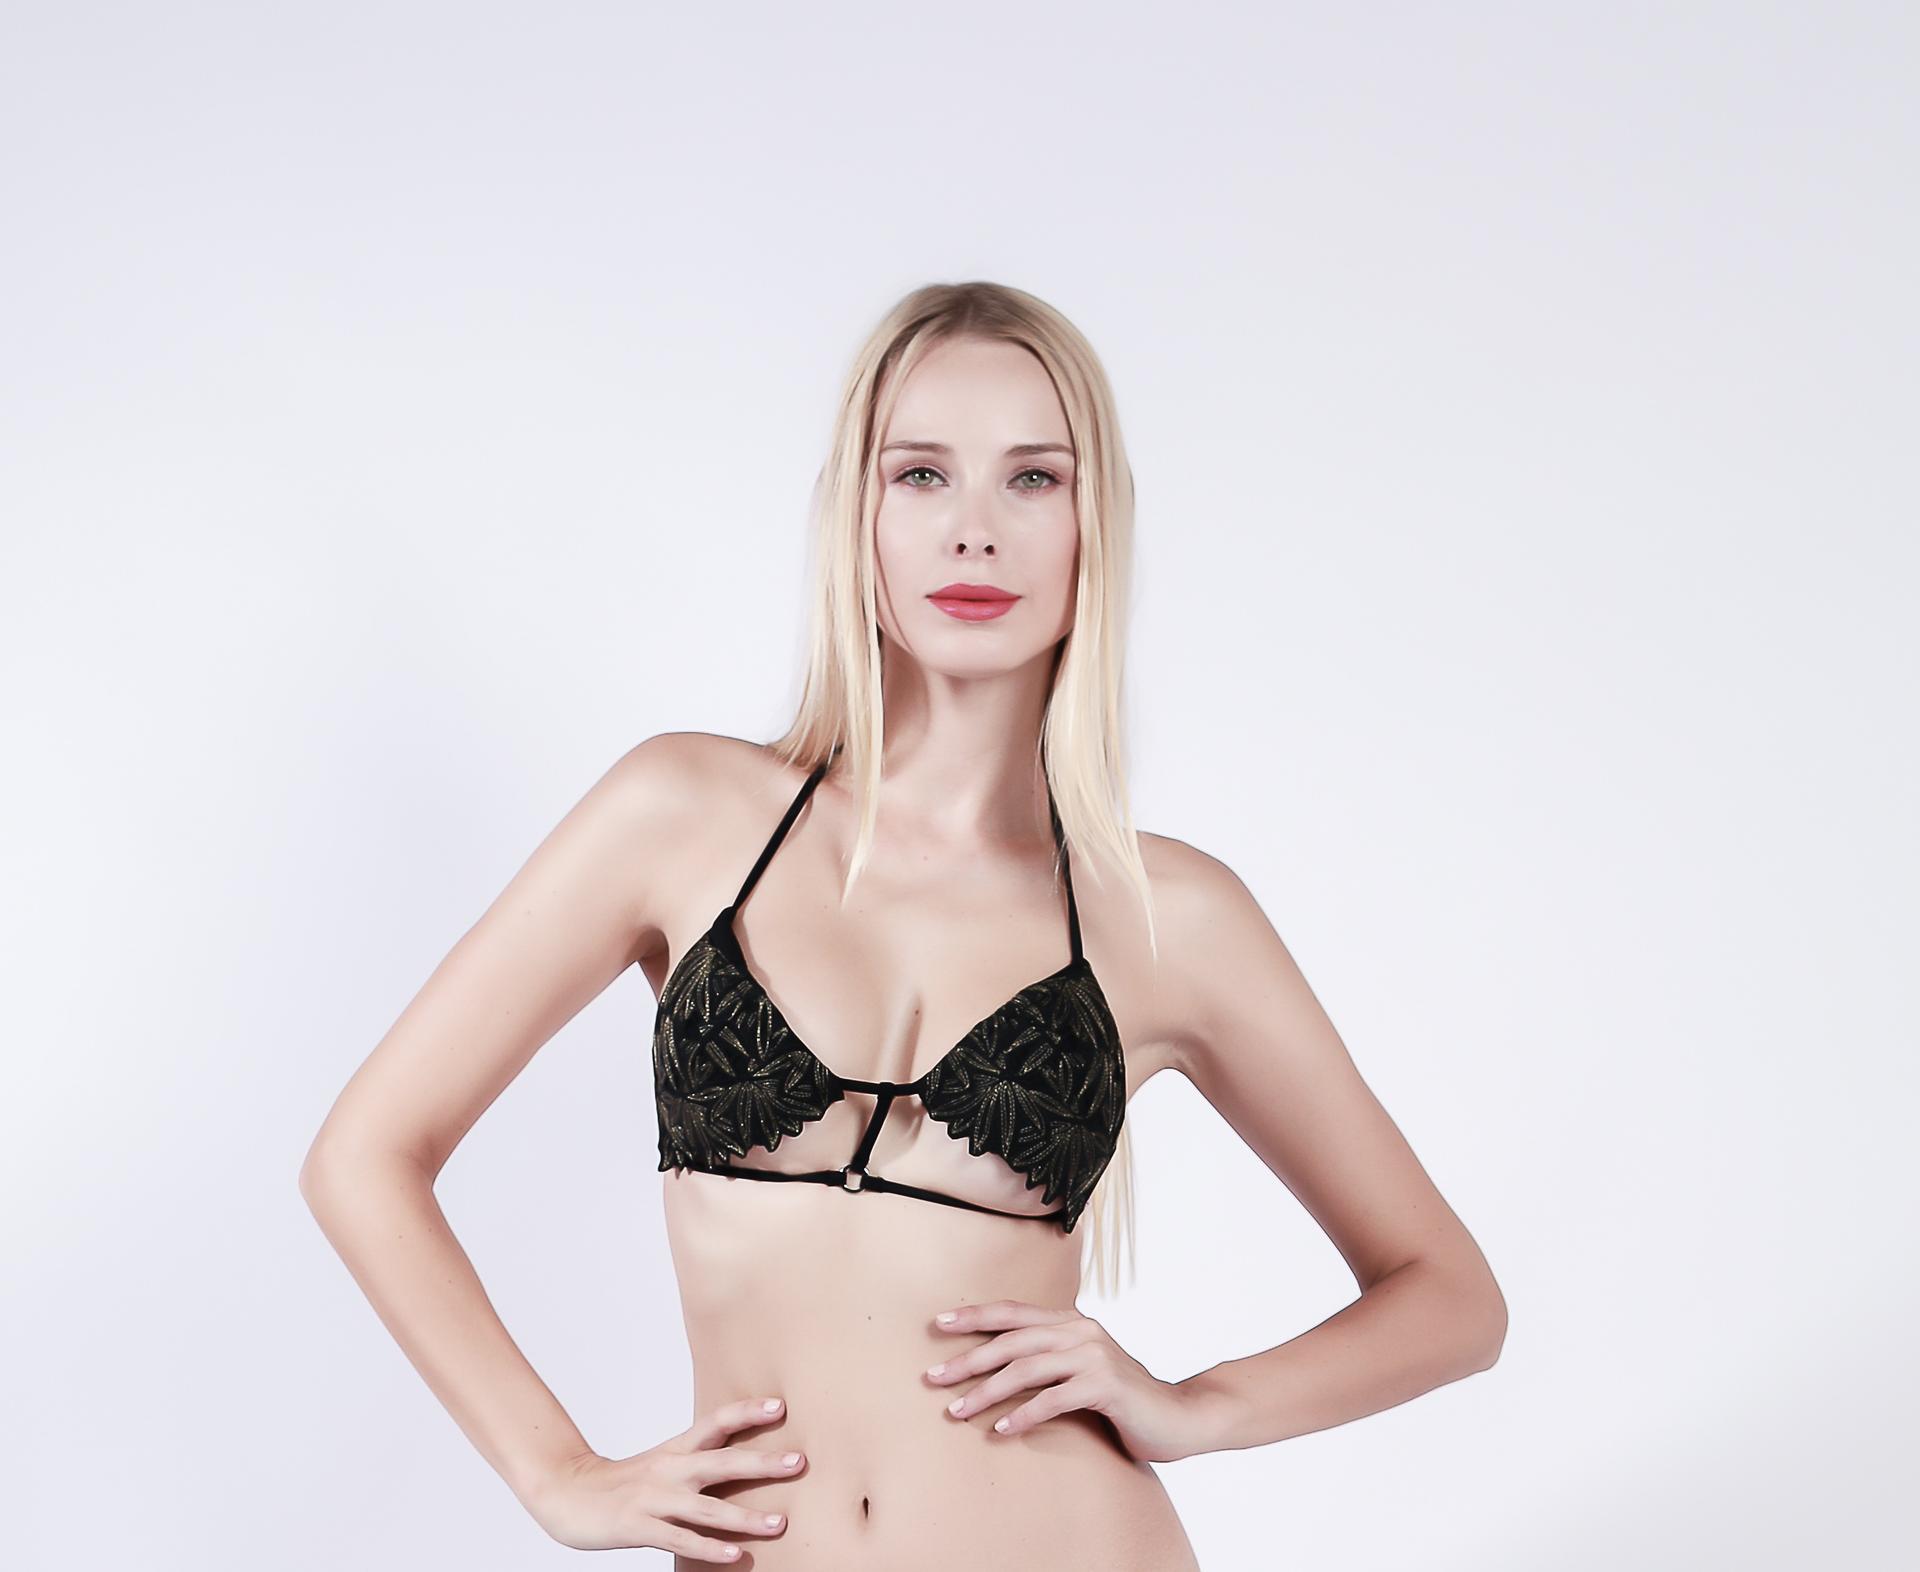 product-Breitex bikini set in floral lurex thread embroidery-Breitex-img-1